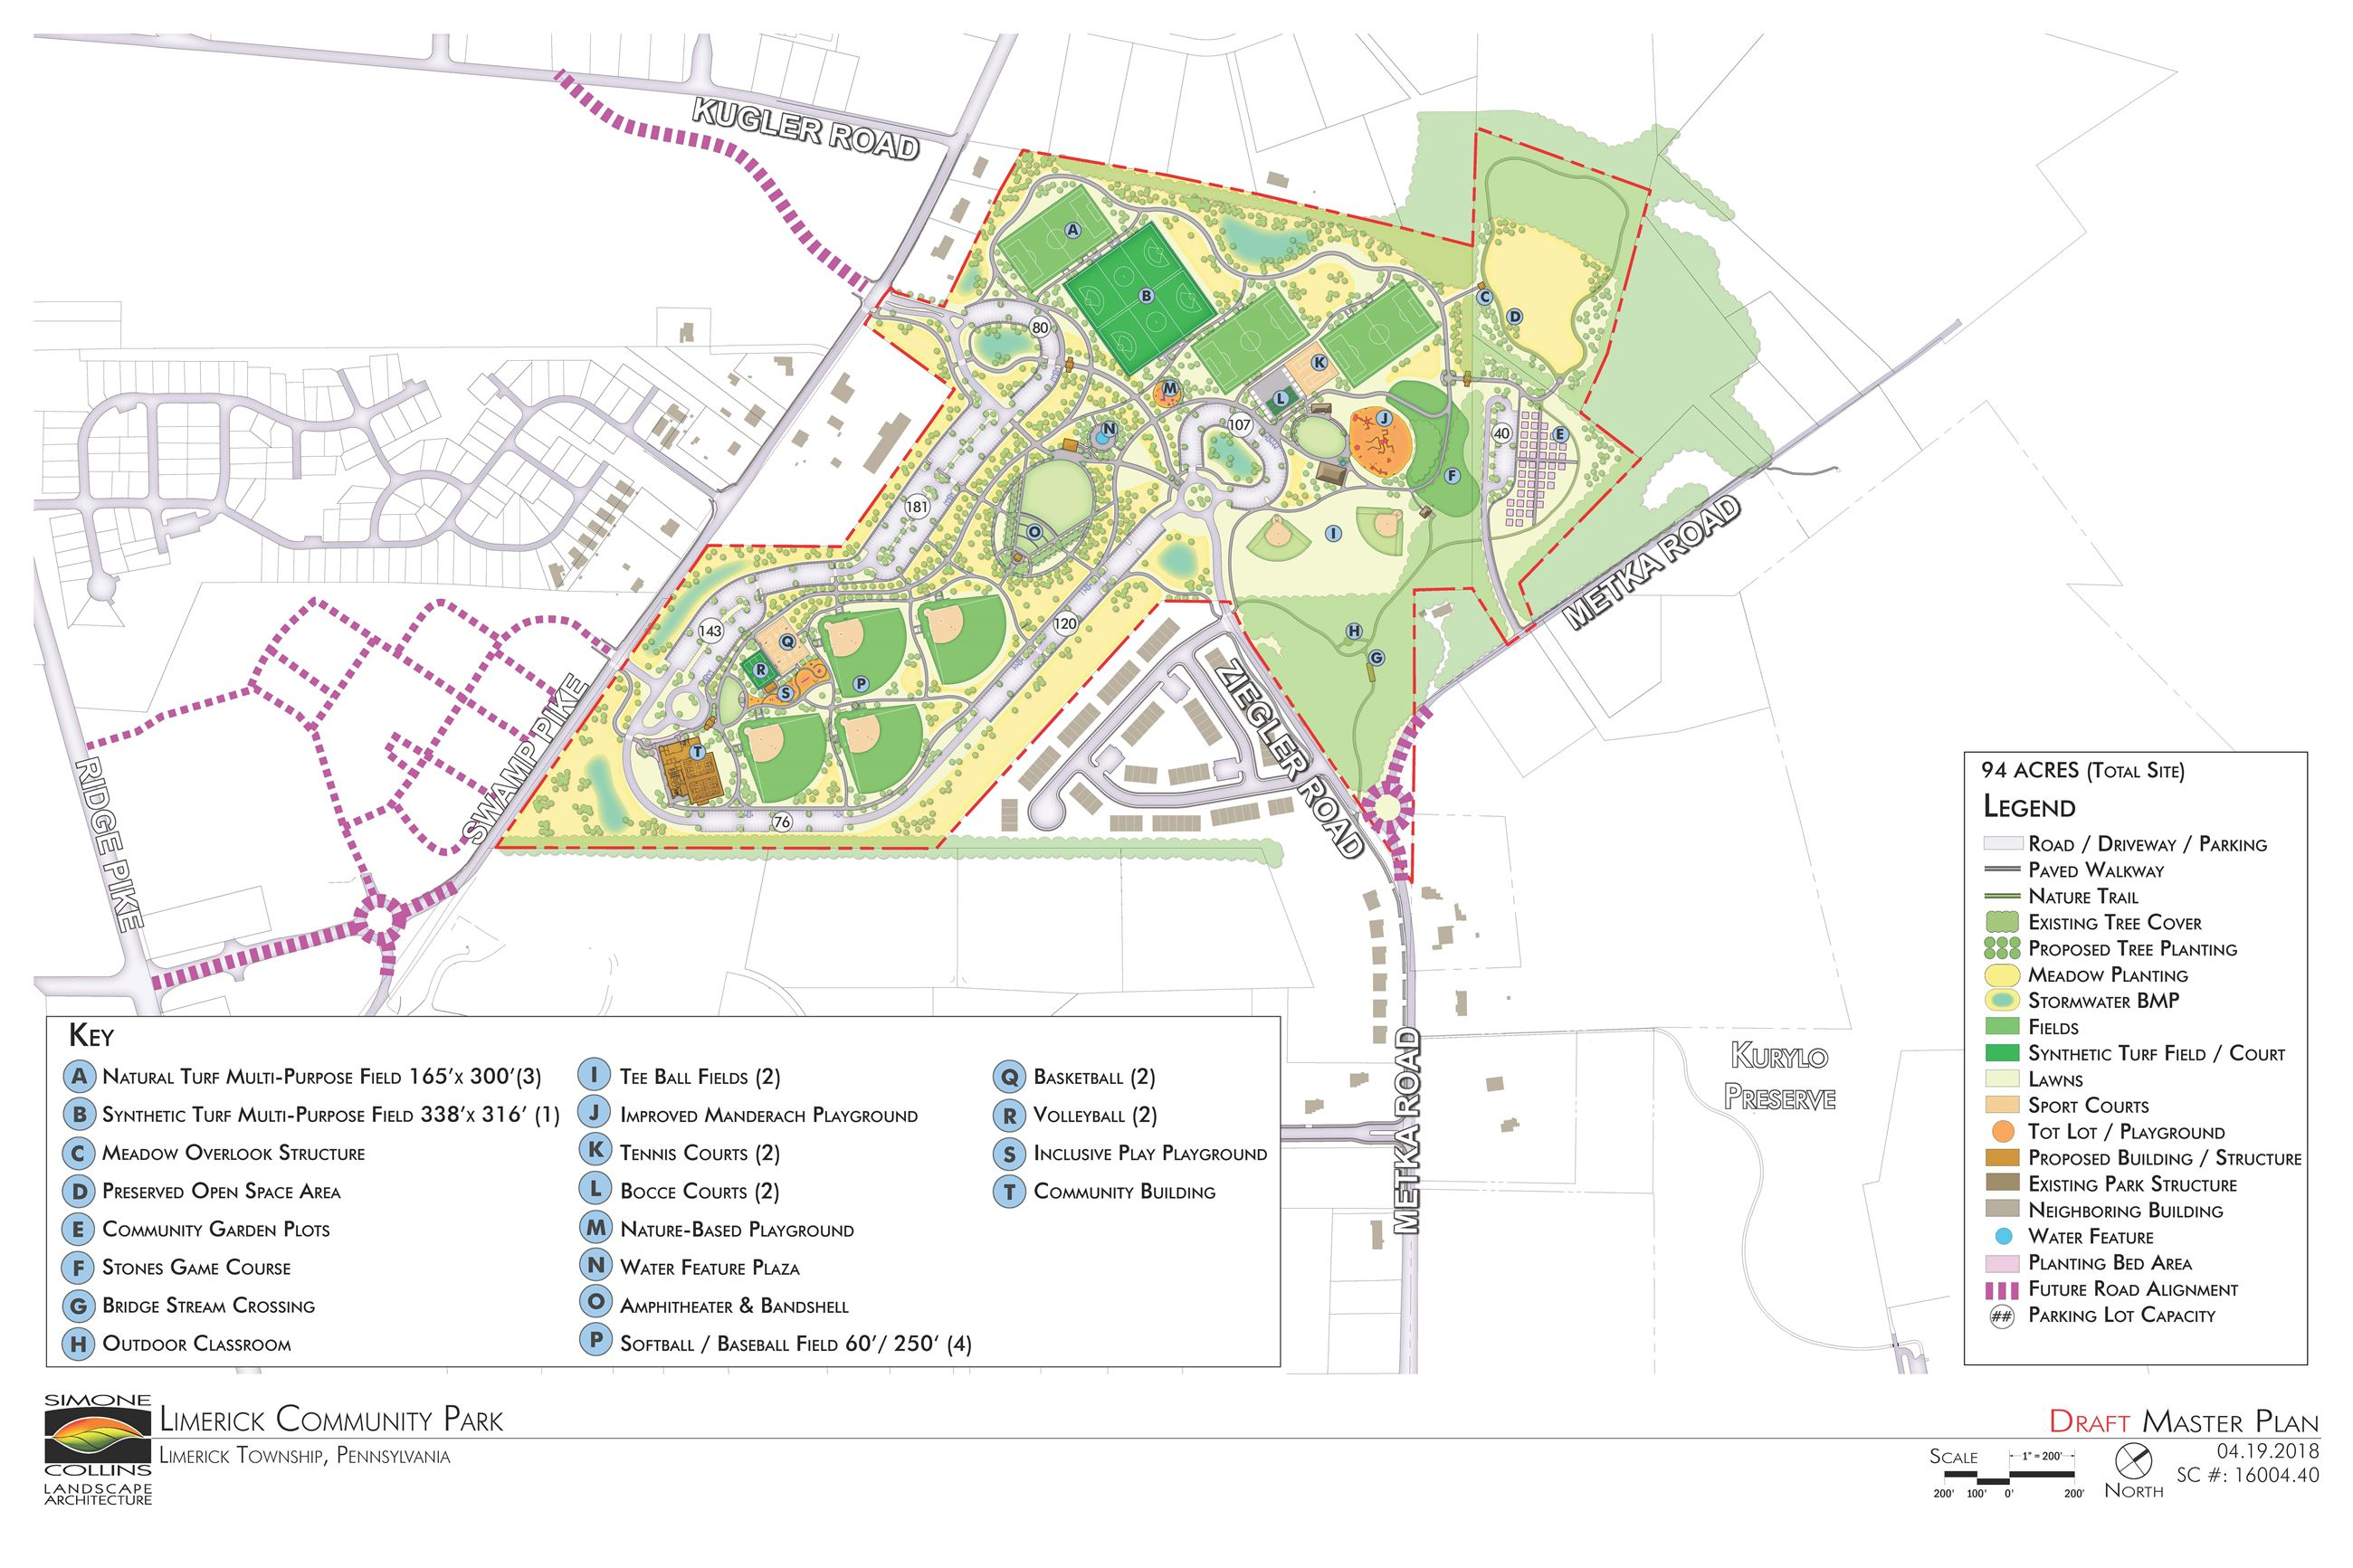 Limerick Community Park Master Plan | Limerick, PA